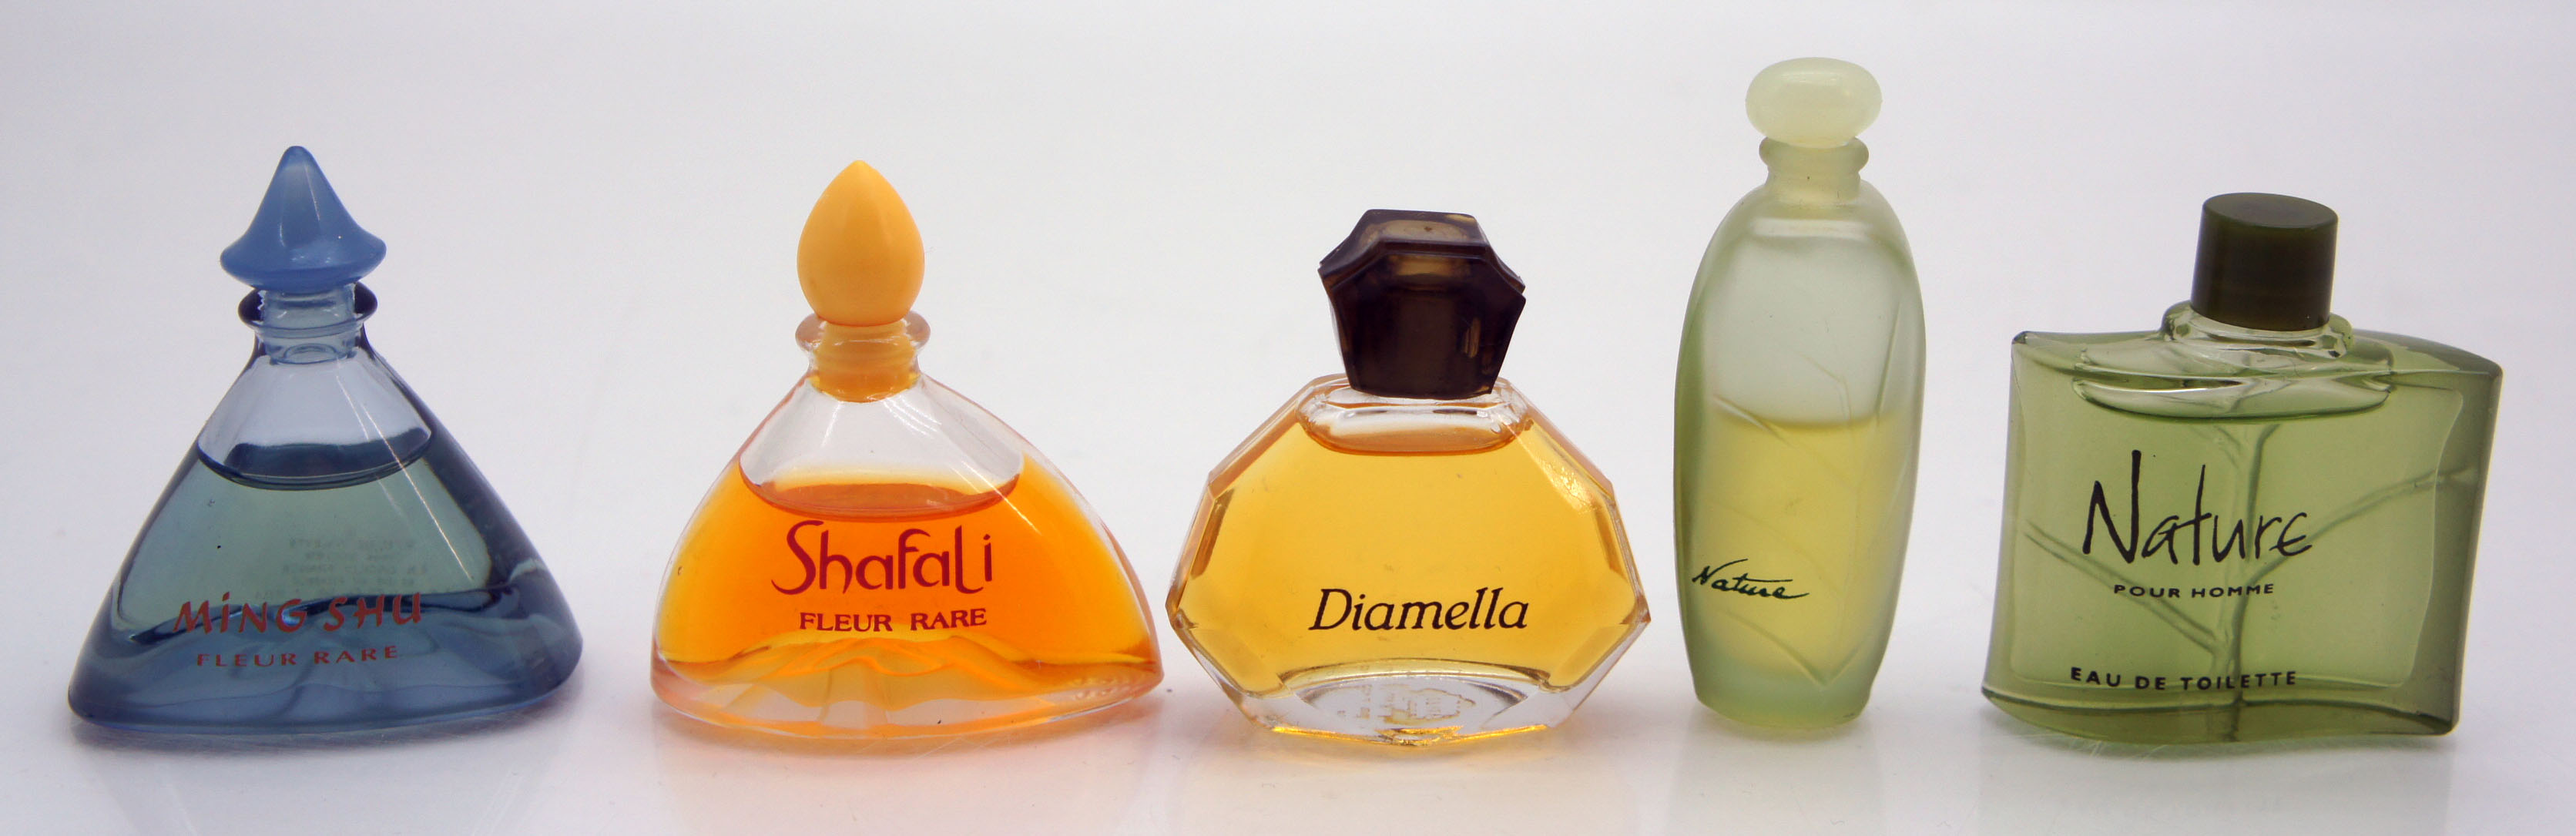 yves rocher 5 parfumminiaturen nature shafali diamella. Black Bedroom Furniture Sets. Home Design Ideas